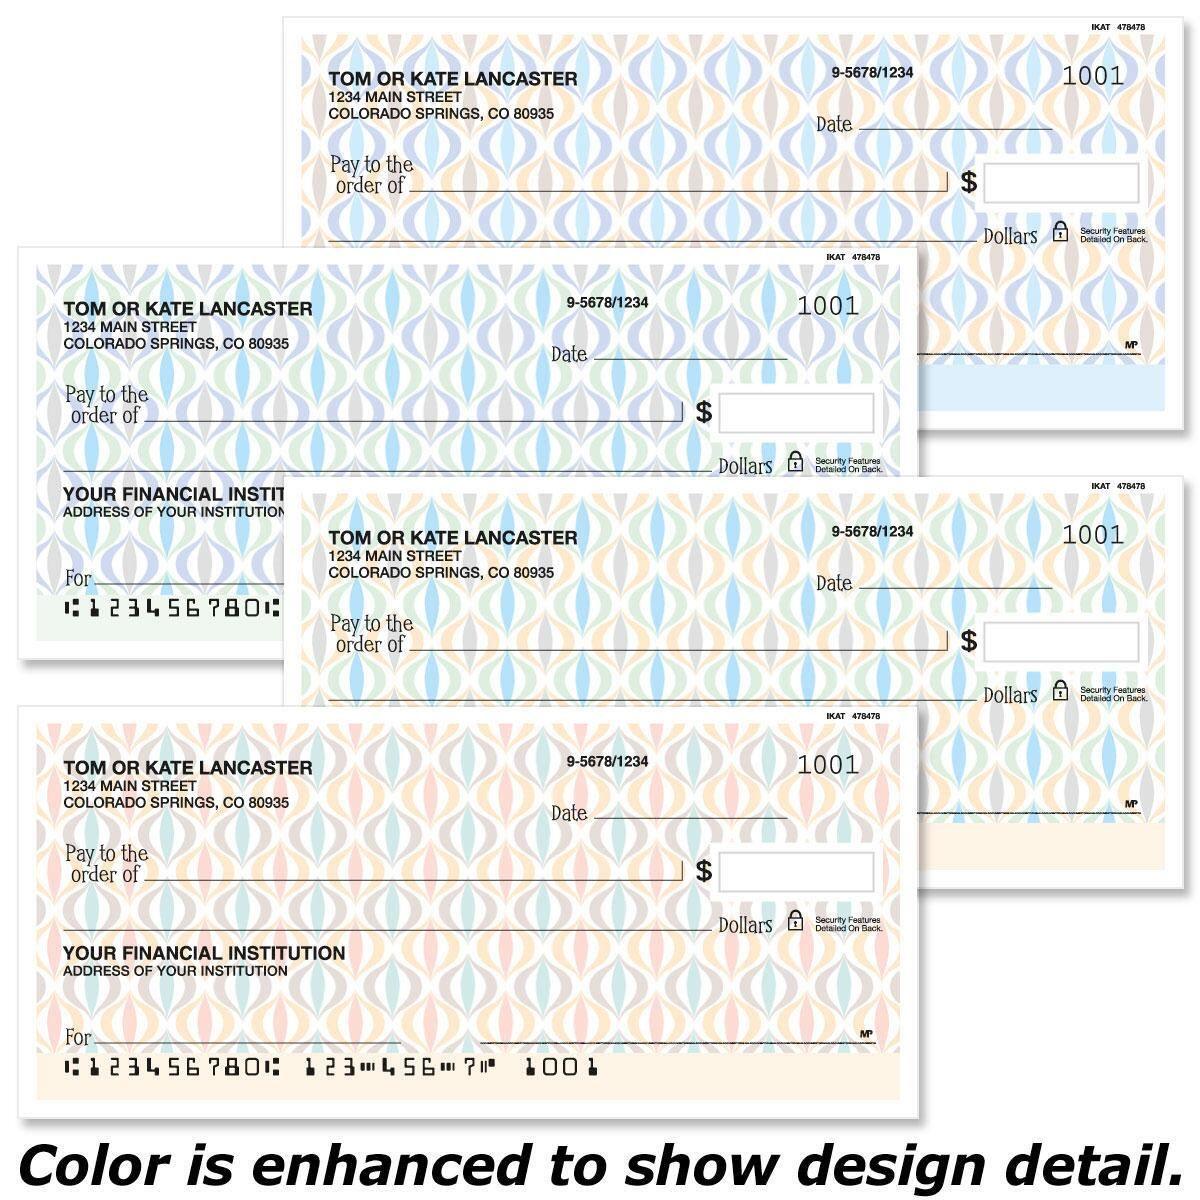 Ikat Duplicate Checks